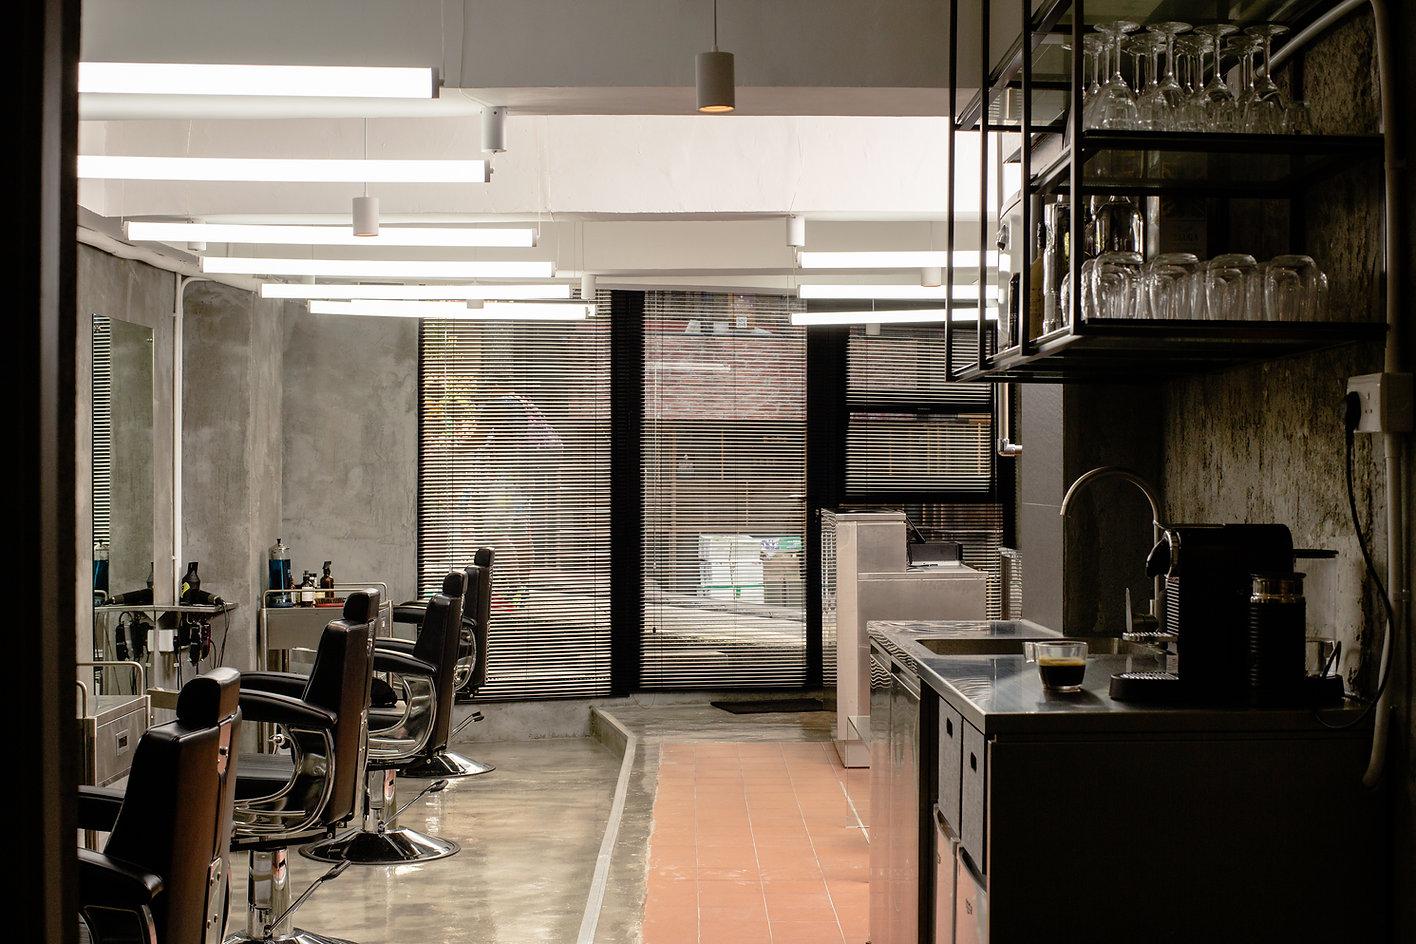 Atelier Shan Sauce Barbershop & Lifestyle Hong Kong